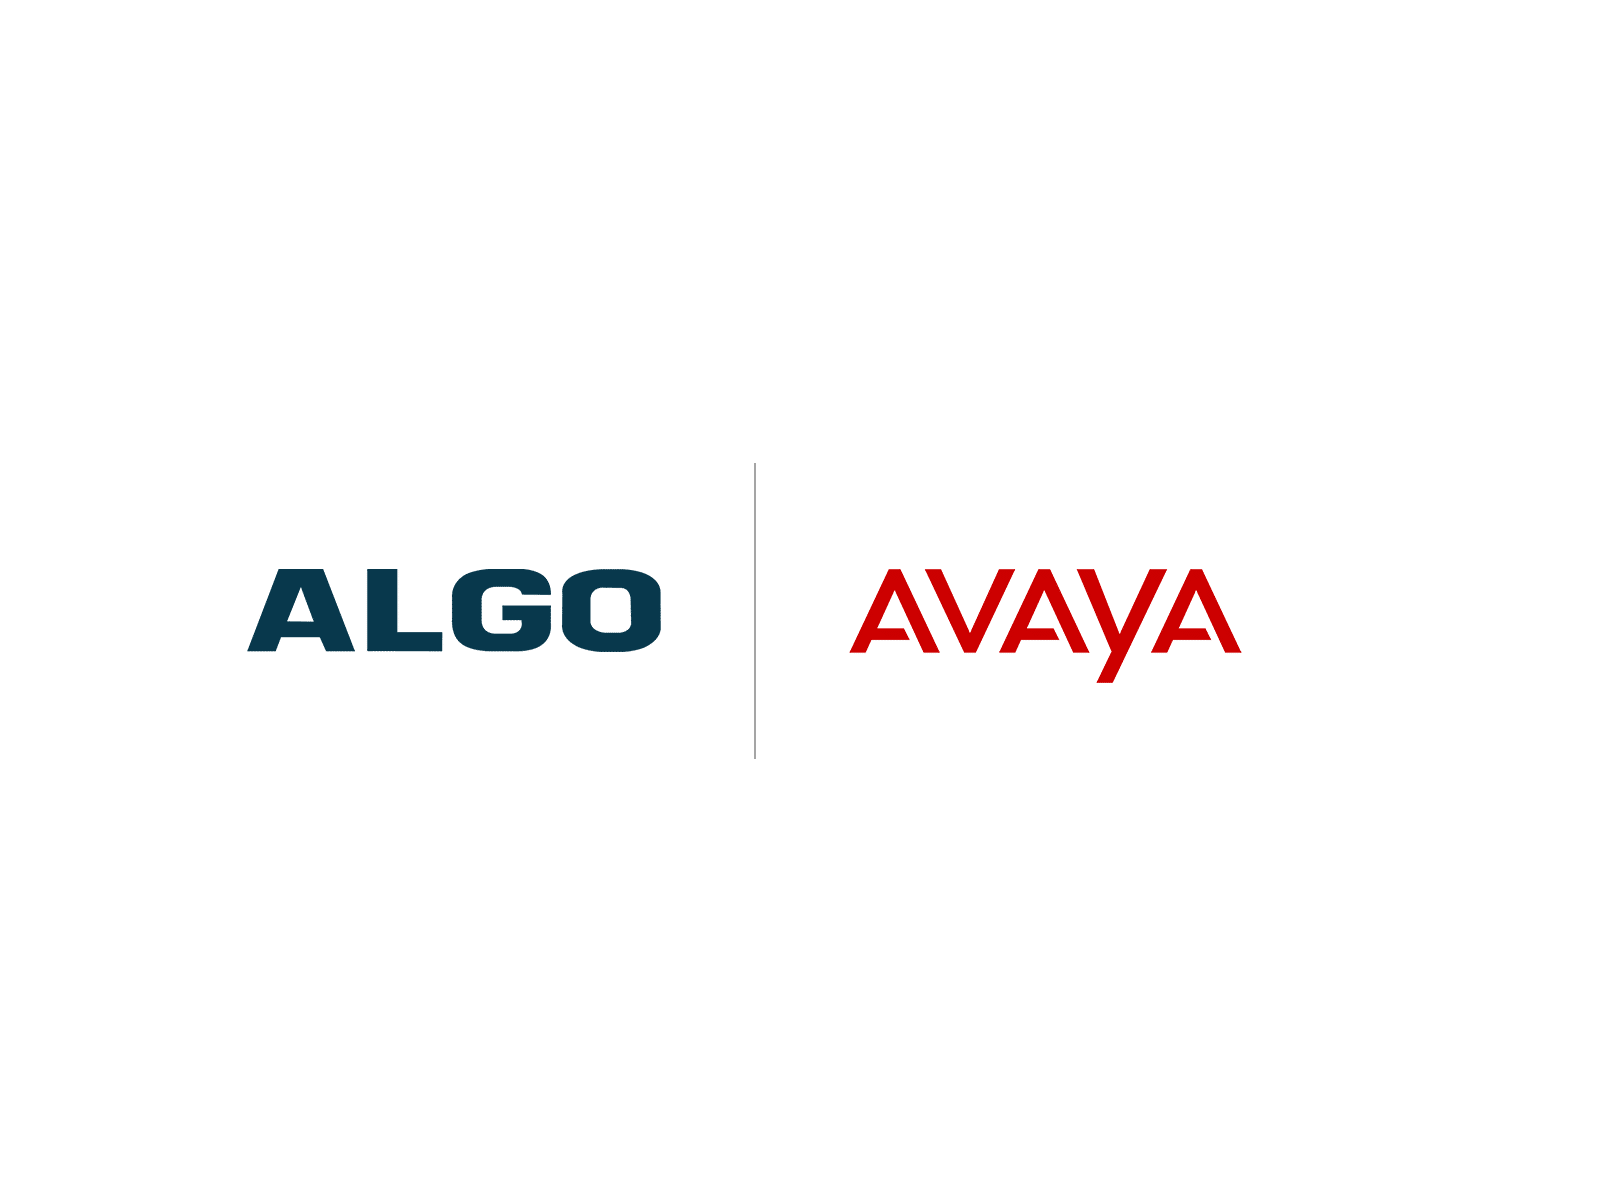 Algo Avaya Logo Compatibility